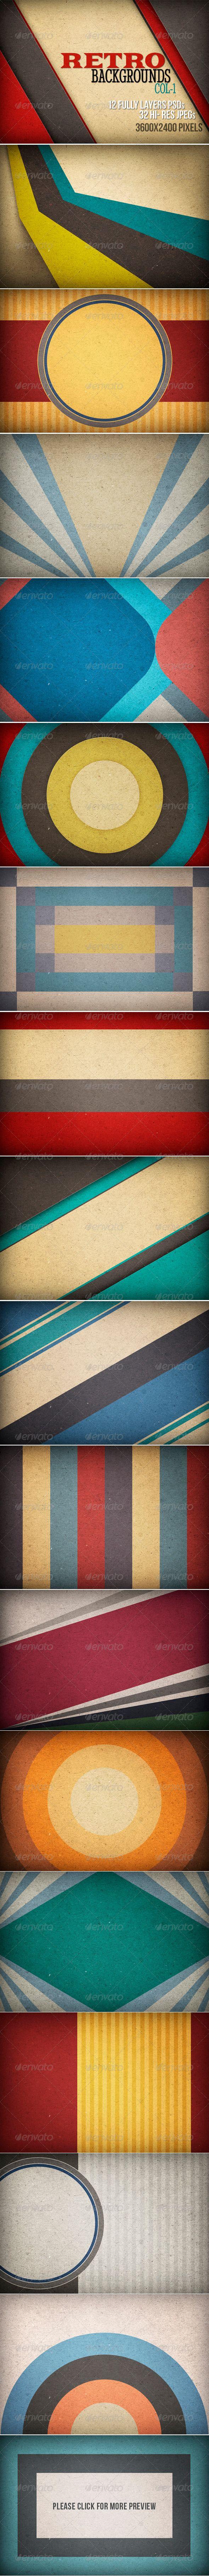 Retro Backgrounds 3600×2400 px, 300 dpi #design Download: http://graphicriver.net/item/retro-backgrounds/5666344?ref=ksioks